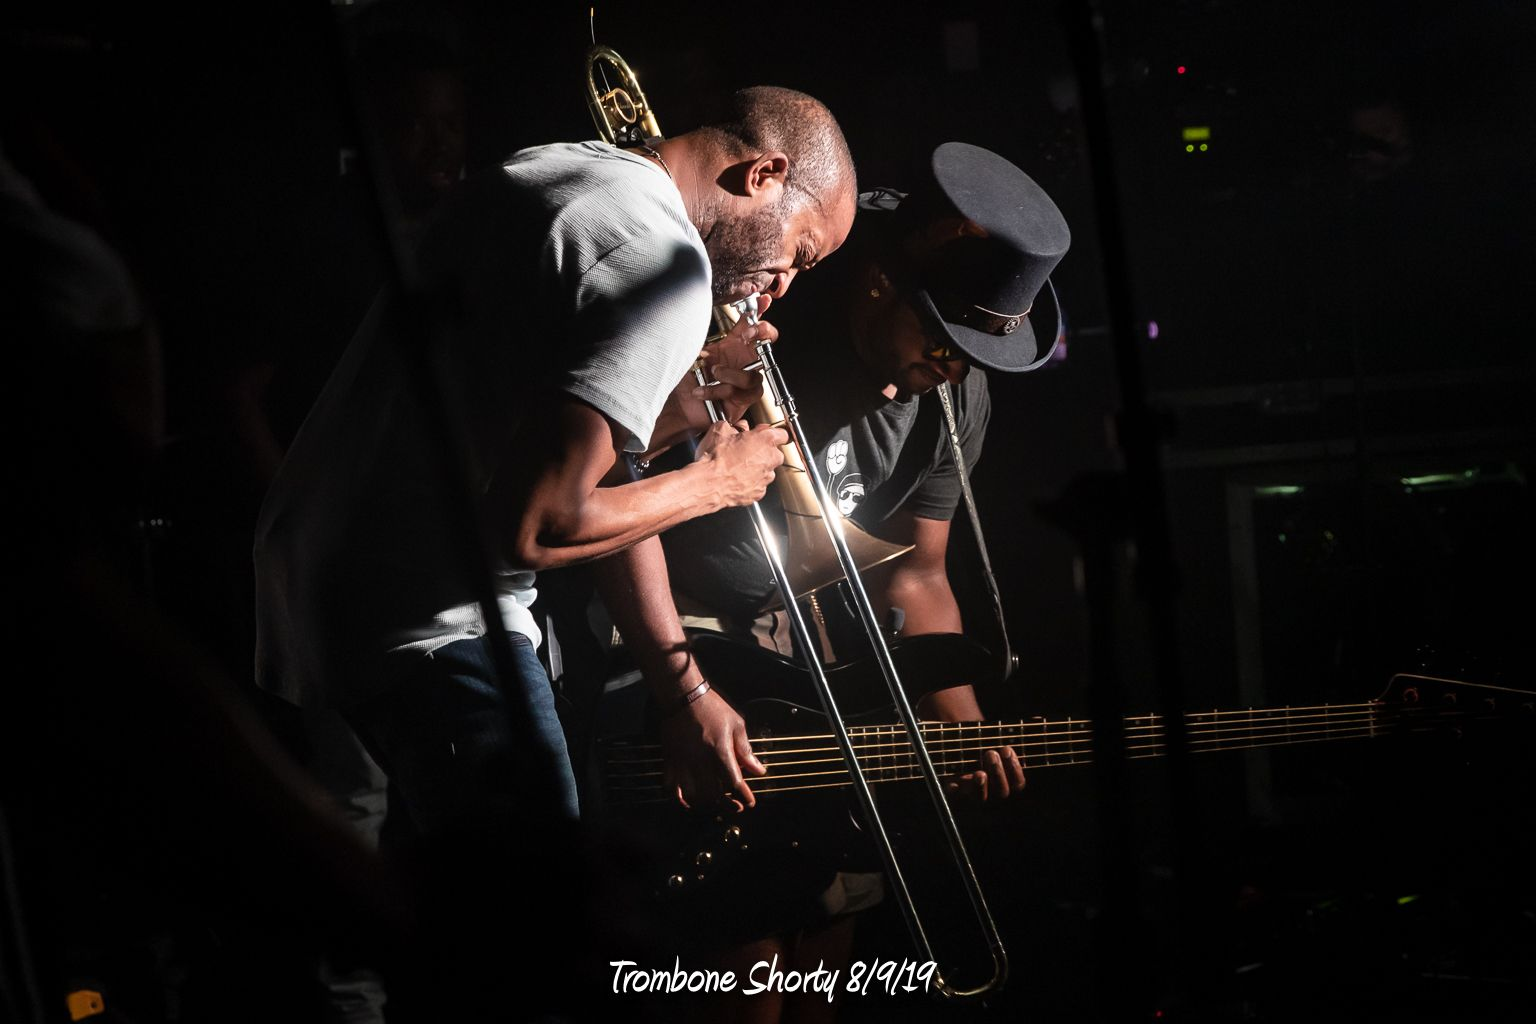 Trombone Shorty 8/9/19